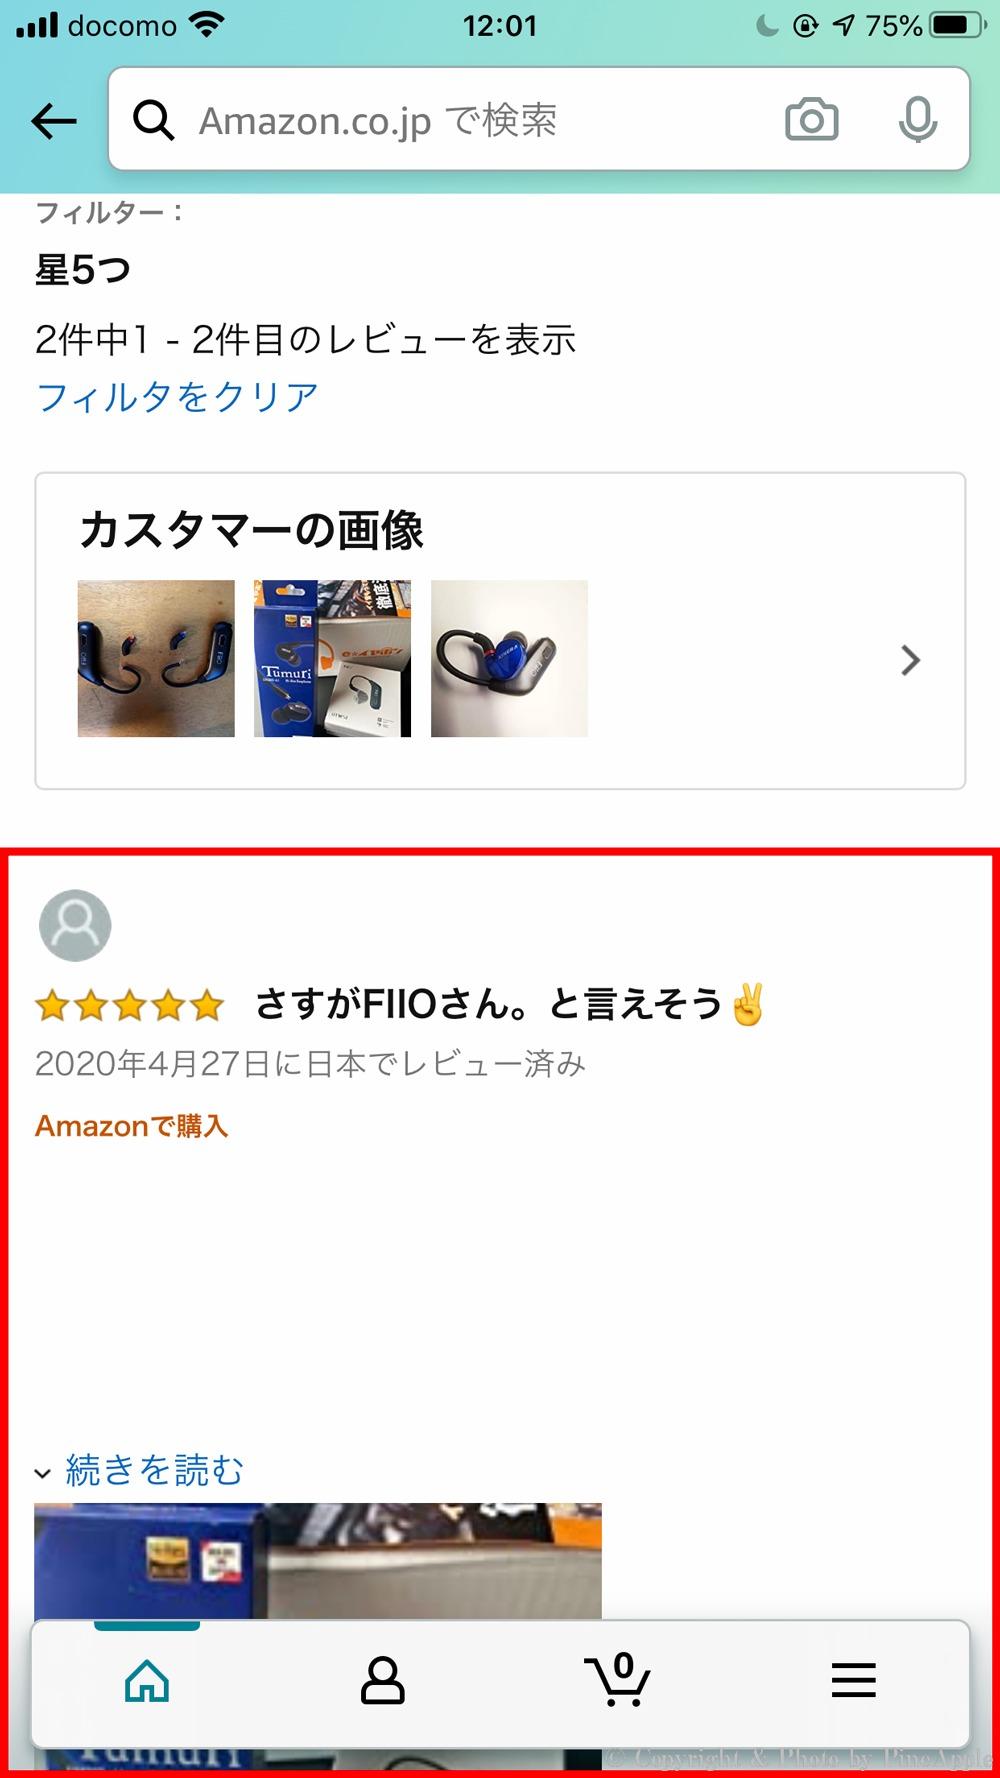 Amazon ショッピングアプリ:「星 5 つ」の評価のみのレビューが表示